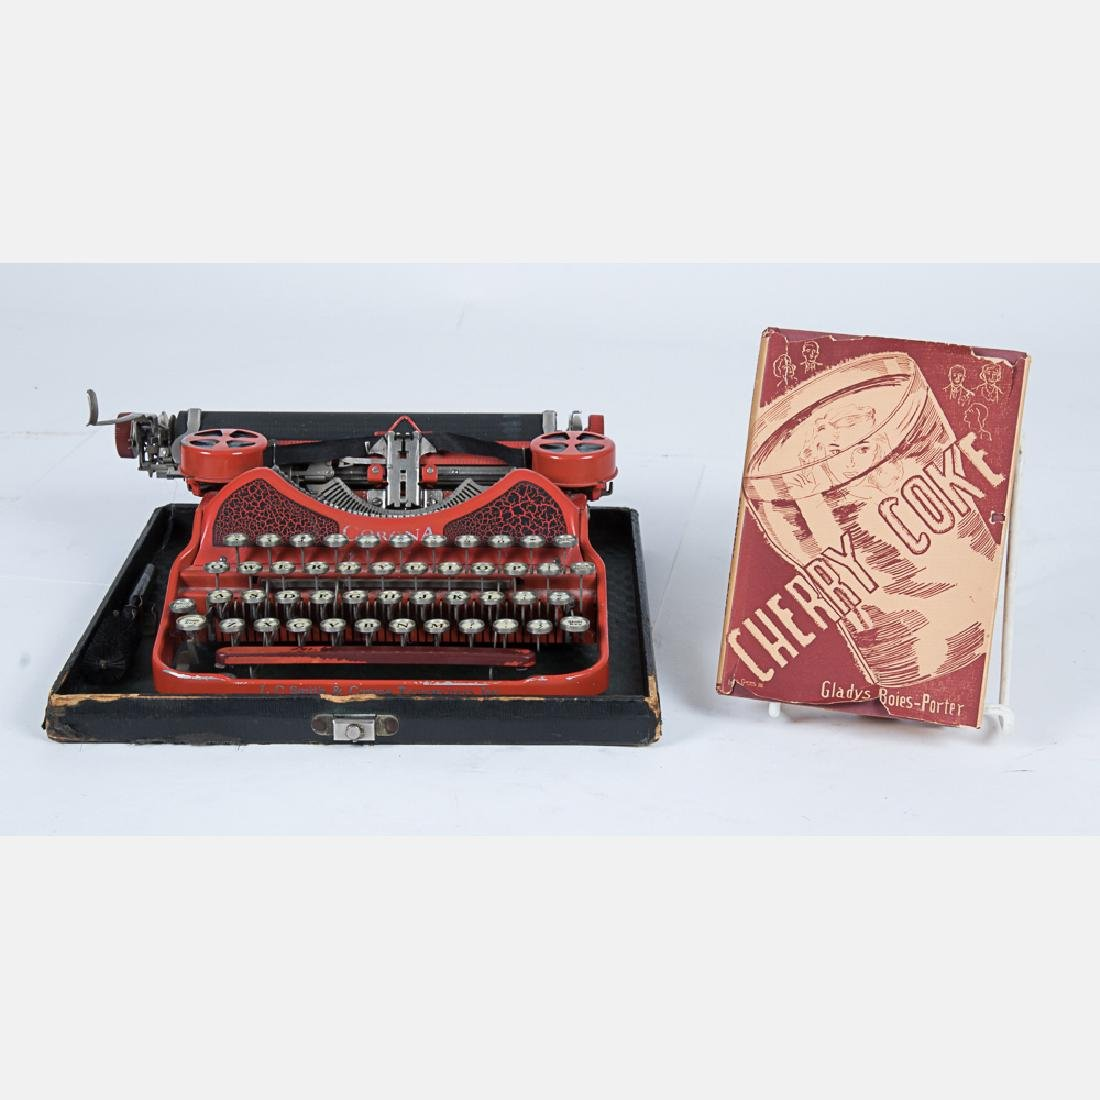 A Vintage Corona Typewriter, 20th Century,